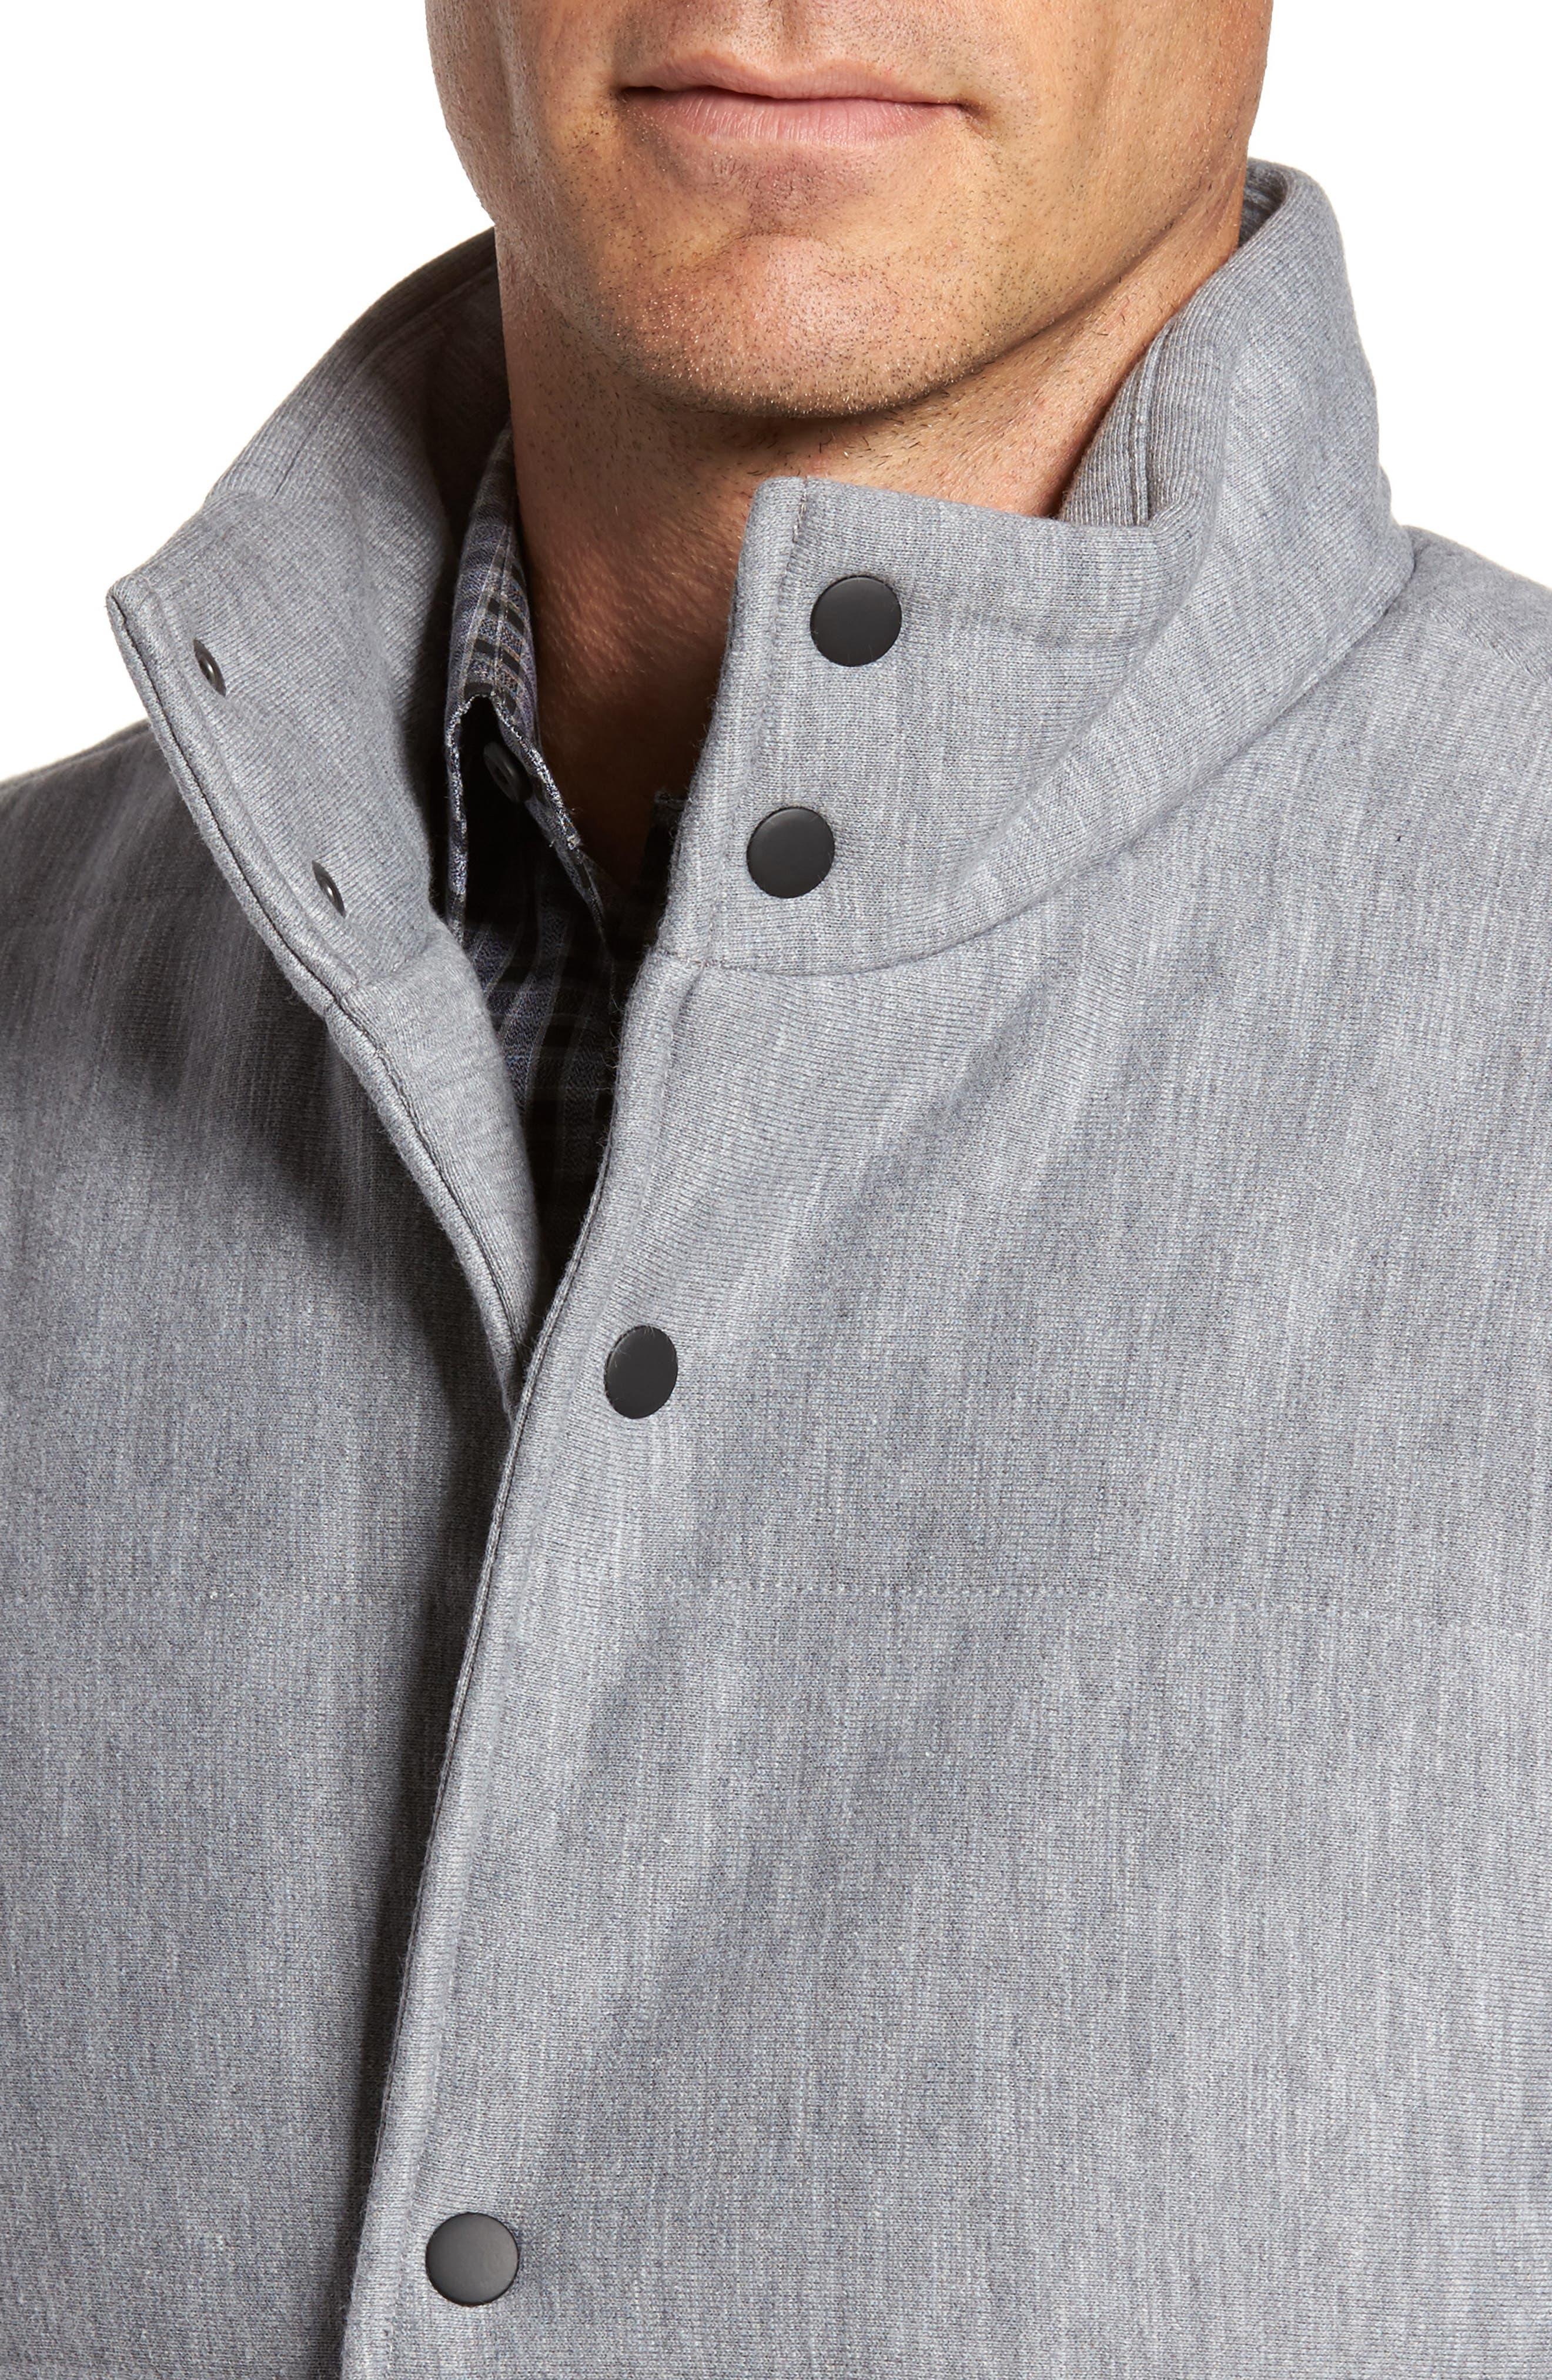 Quilted Fleece Vest,                             Alternate thumbnail 7, color,